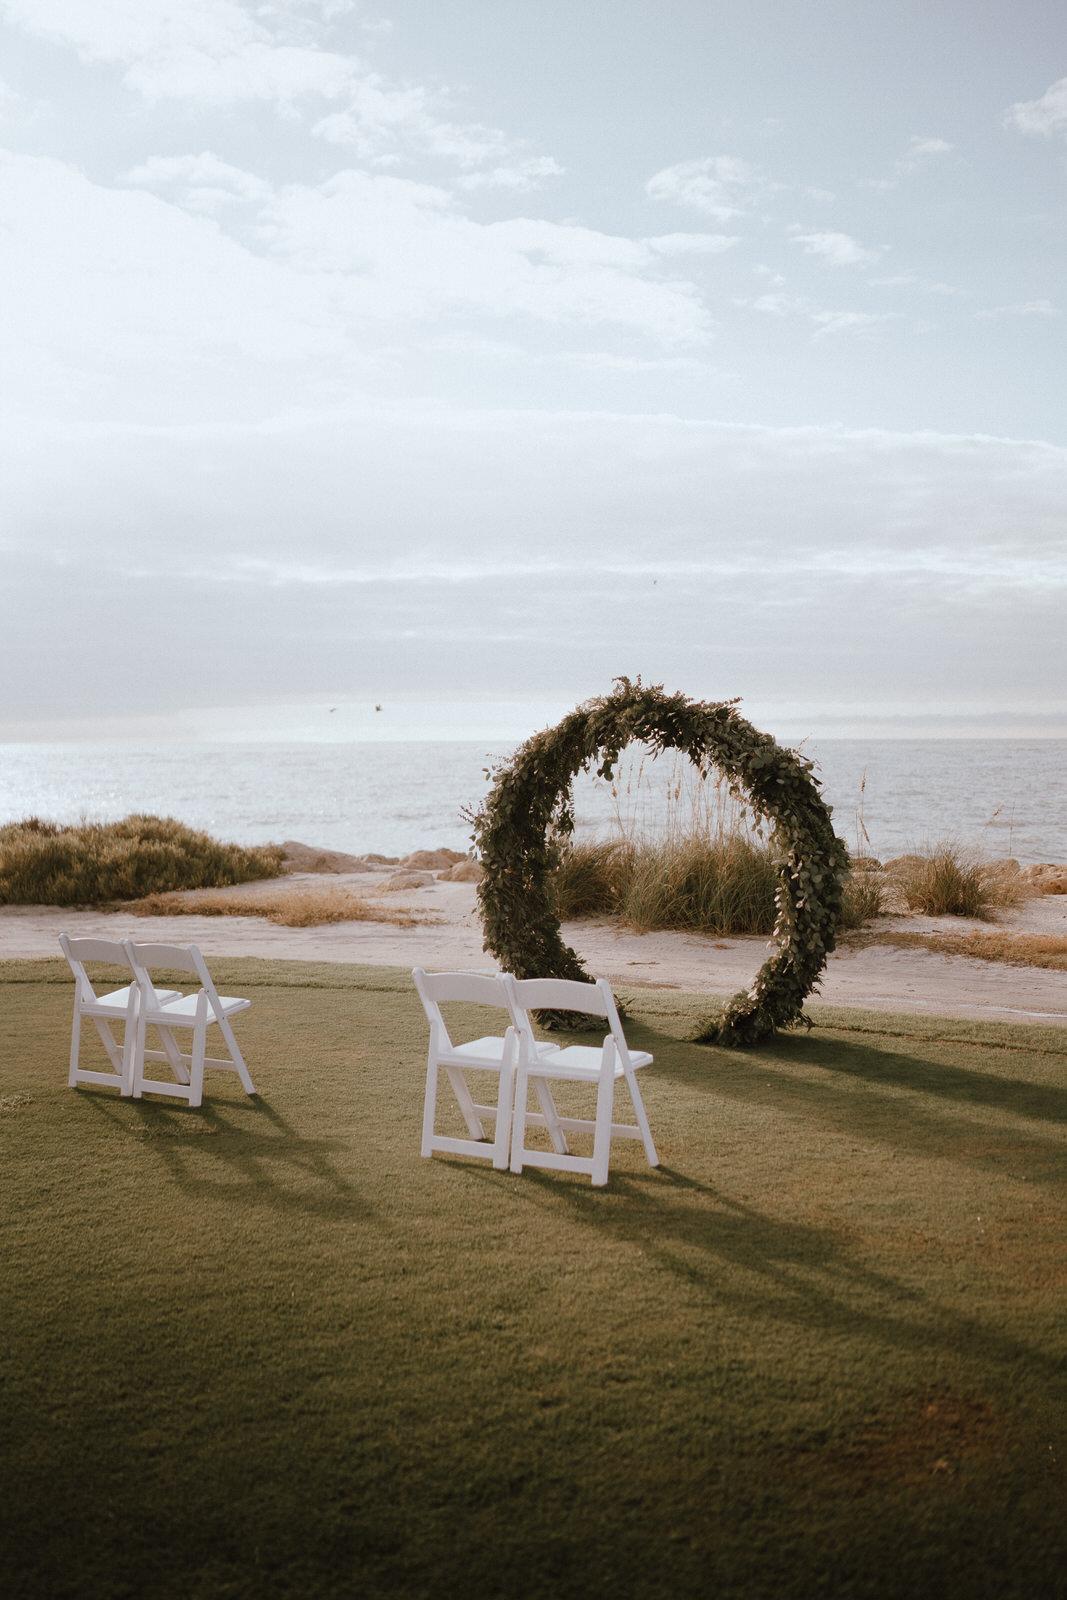 South Seas Island Resort Elopement- Alyana and Shawn- Michelle Gonzalez Photography-414.JPG